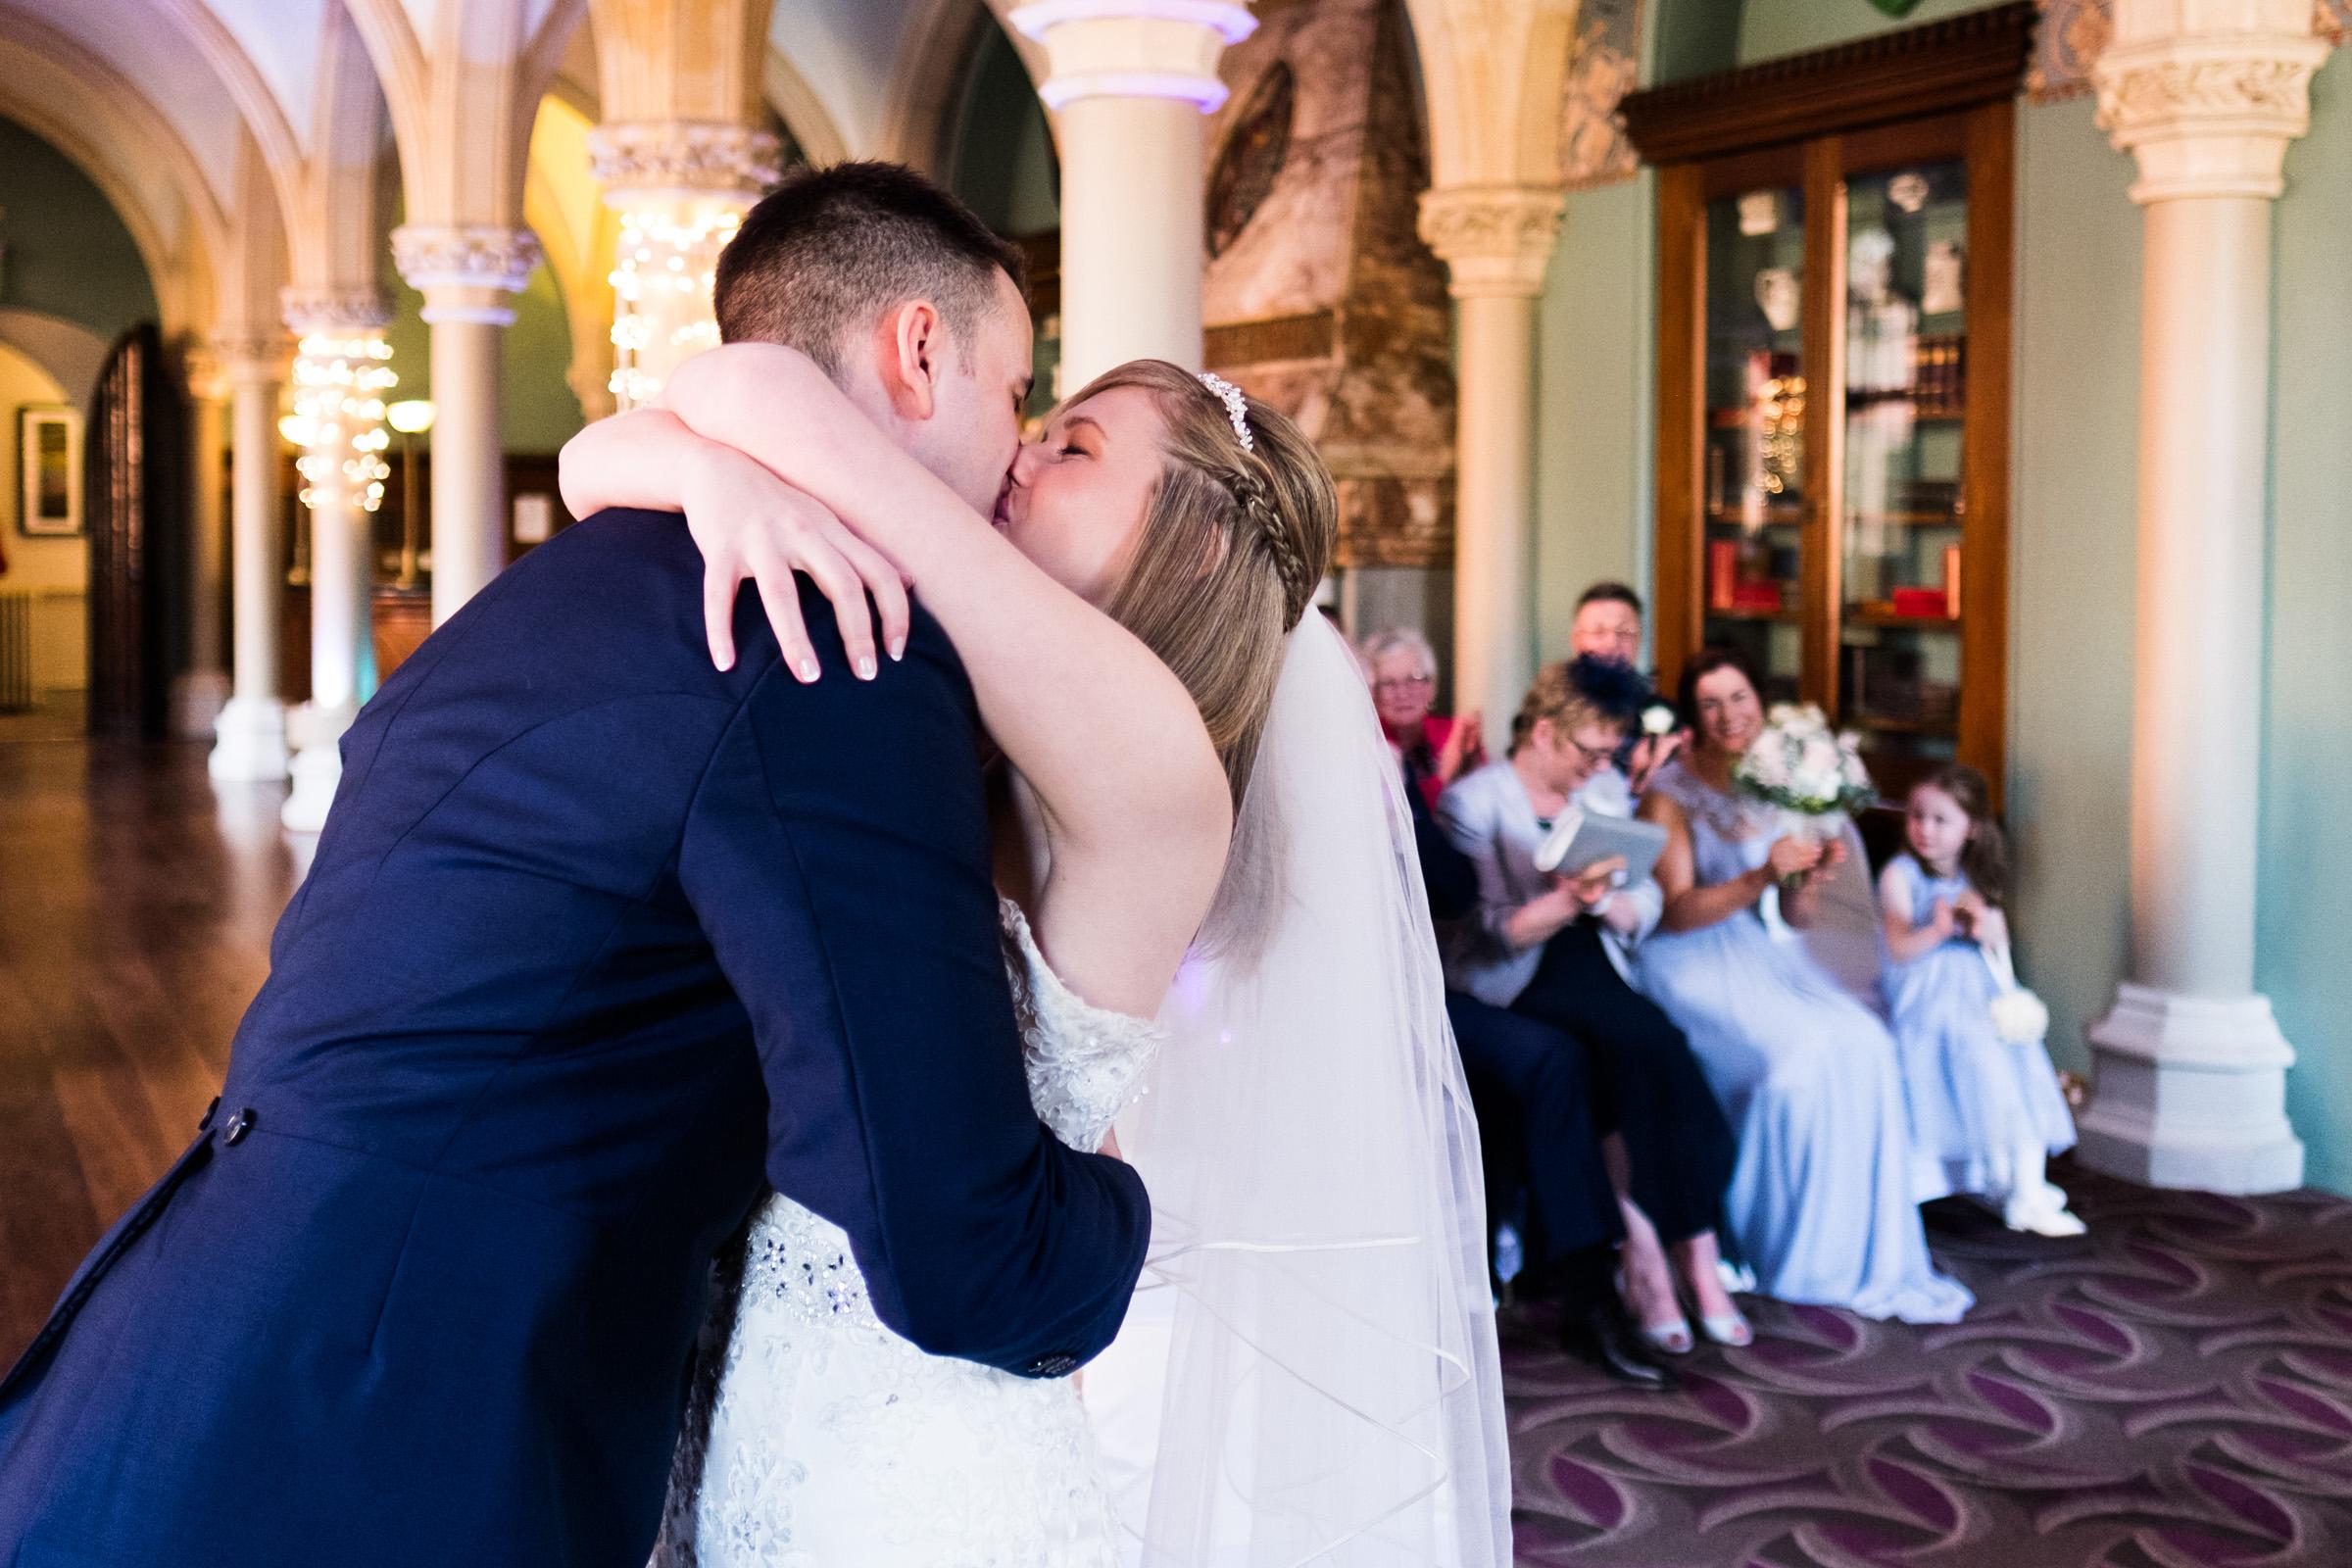 Donna & Nick's Wedding at Wotton House in Dorking 011.jpg